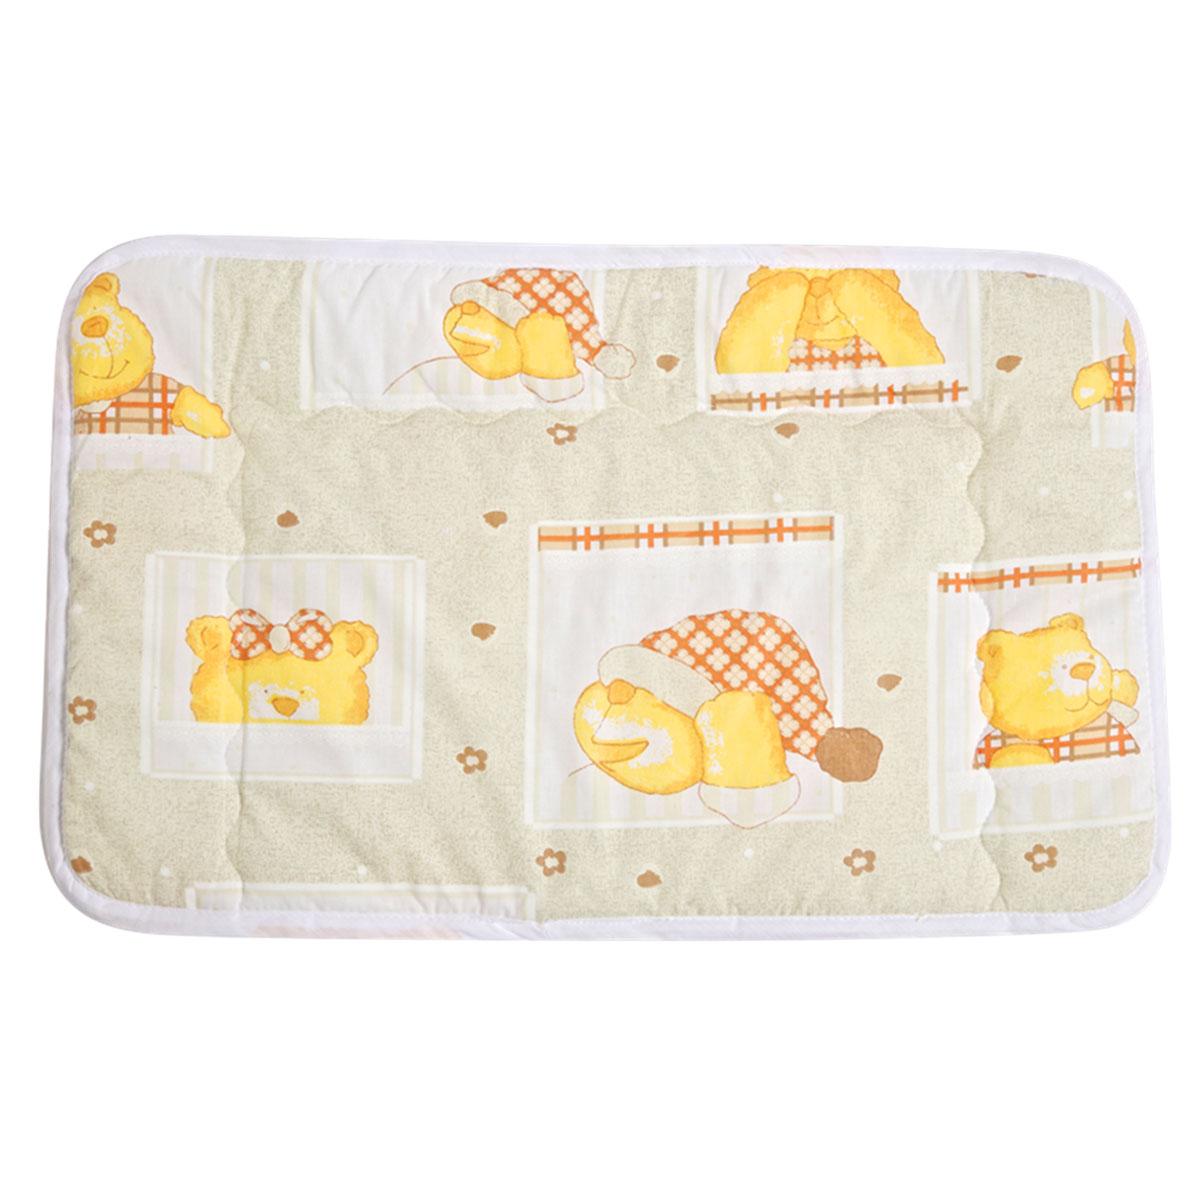 Подушка детская Primavelle Fani, цвет: бежевый, 40 см х 60 см113110303-10